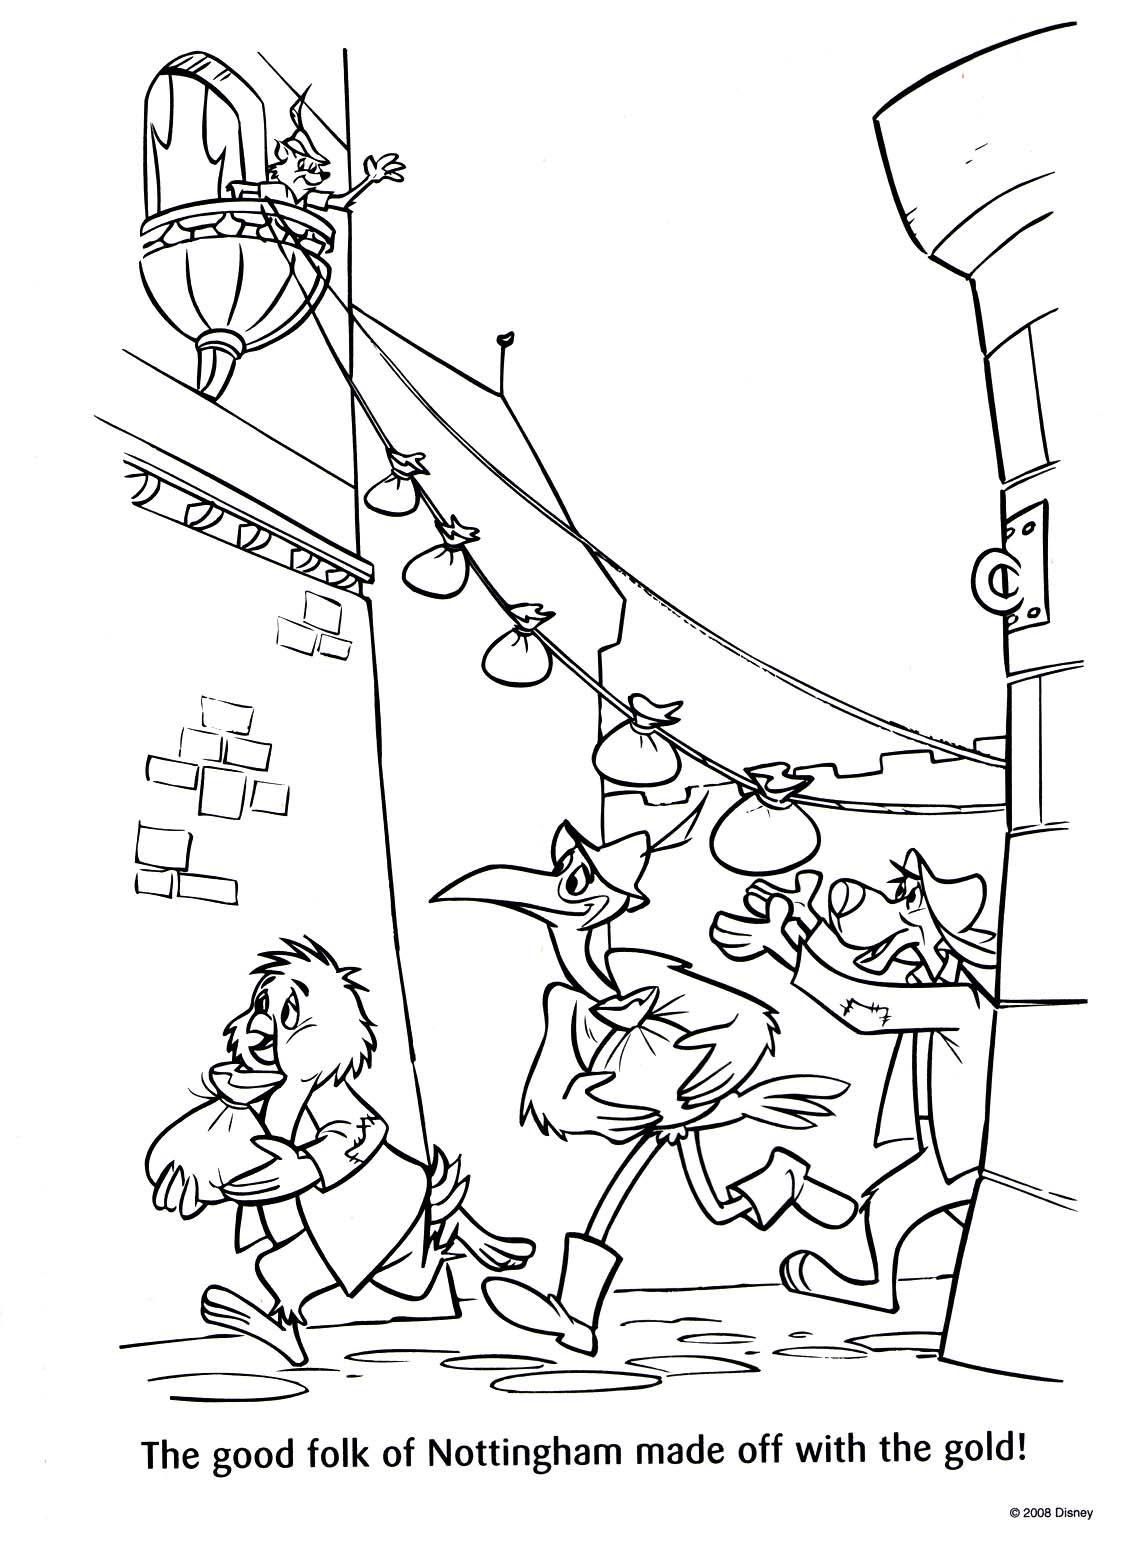 Disney Coloring Pages Robin Hood Disney Coloring Pages Coloring Pages Coloring For Kids